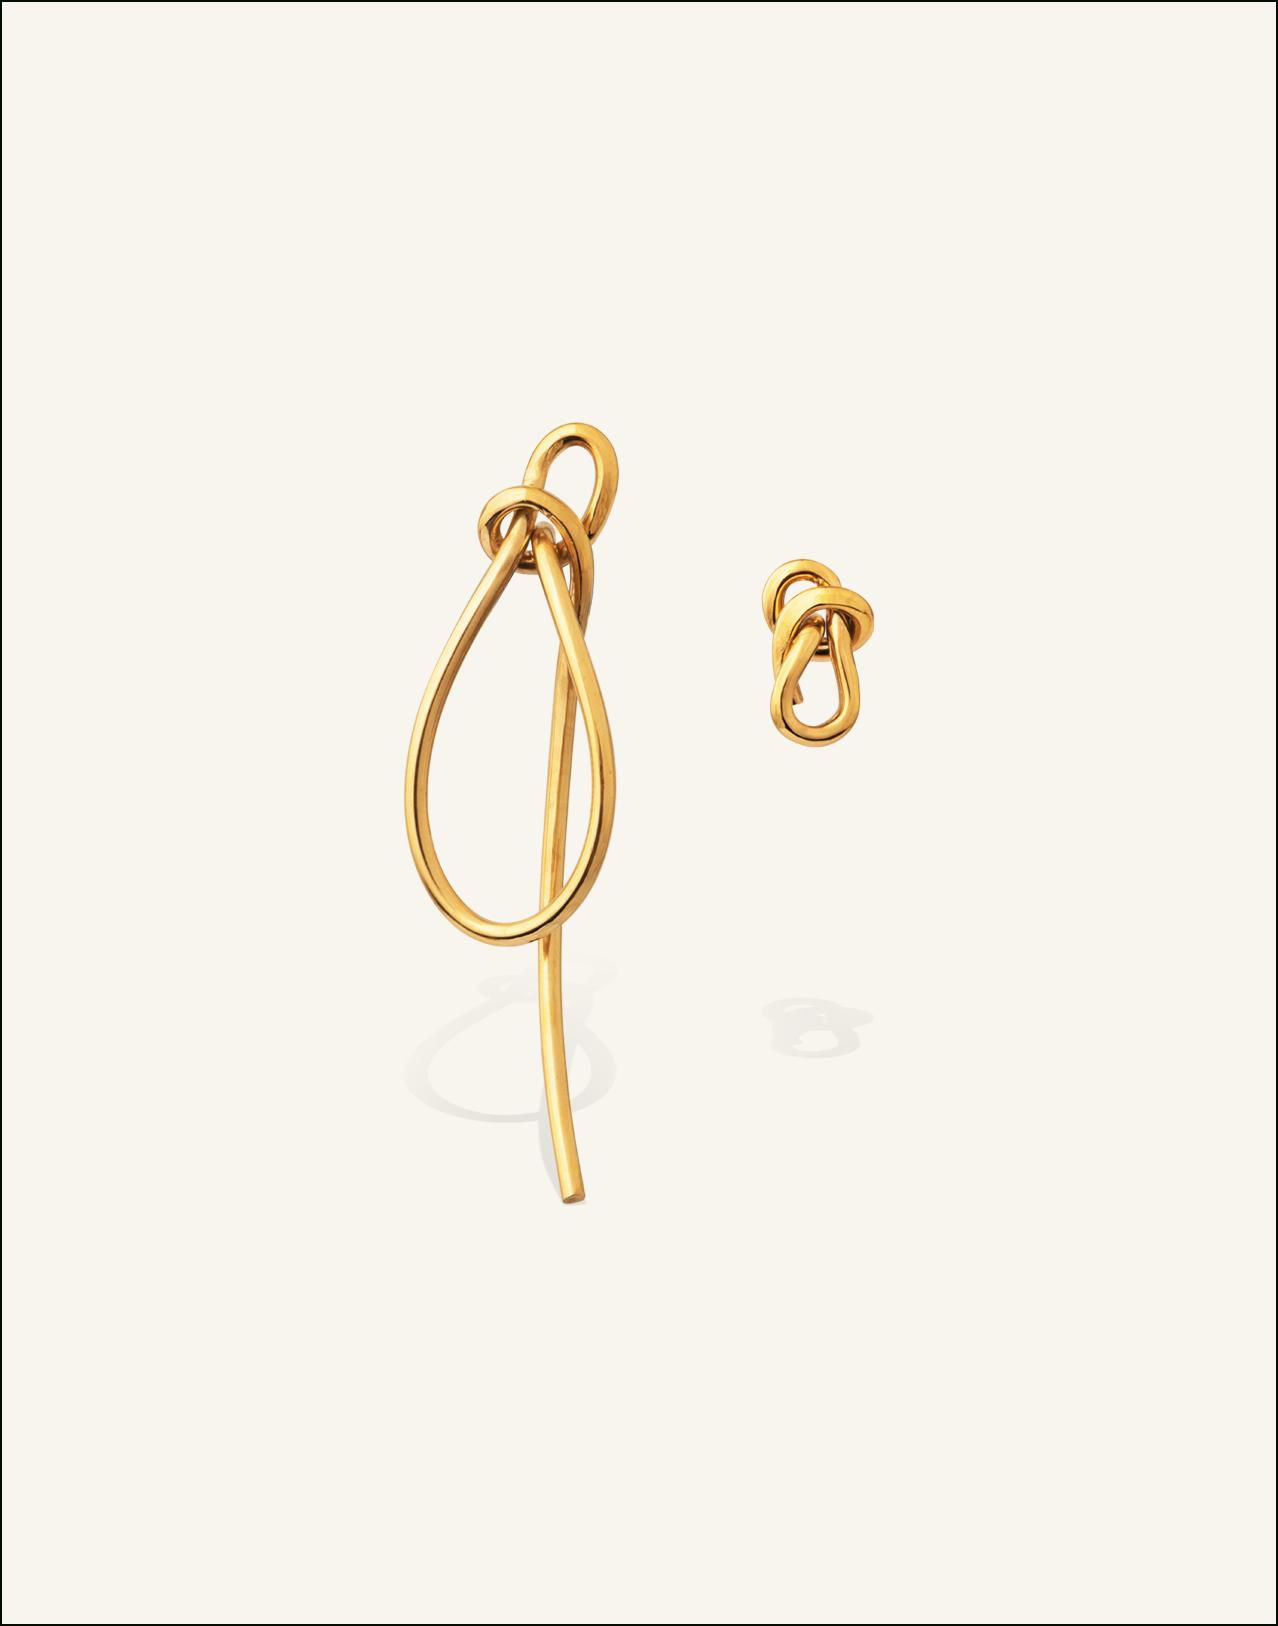 Completedworks-Earrings-The-Bird-1-1.jpg